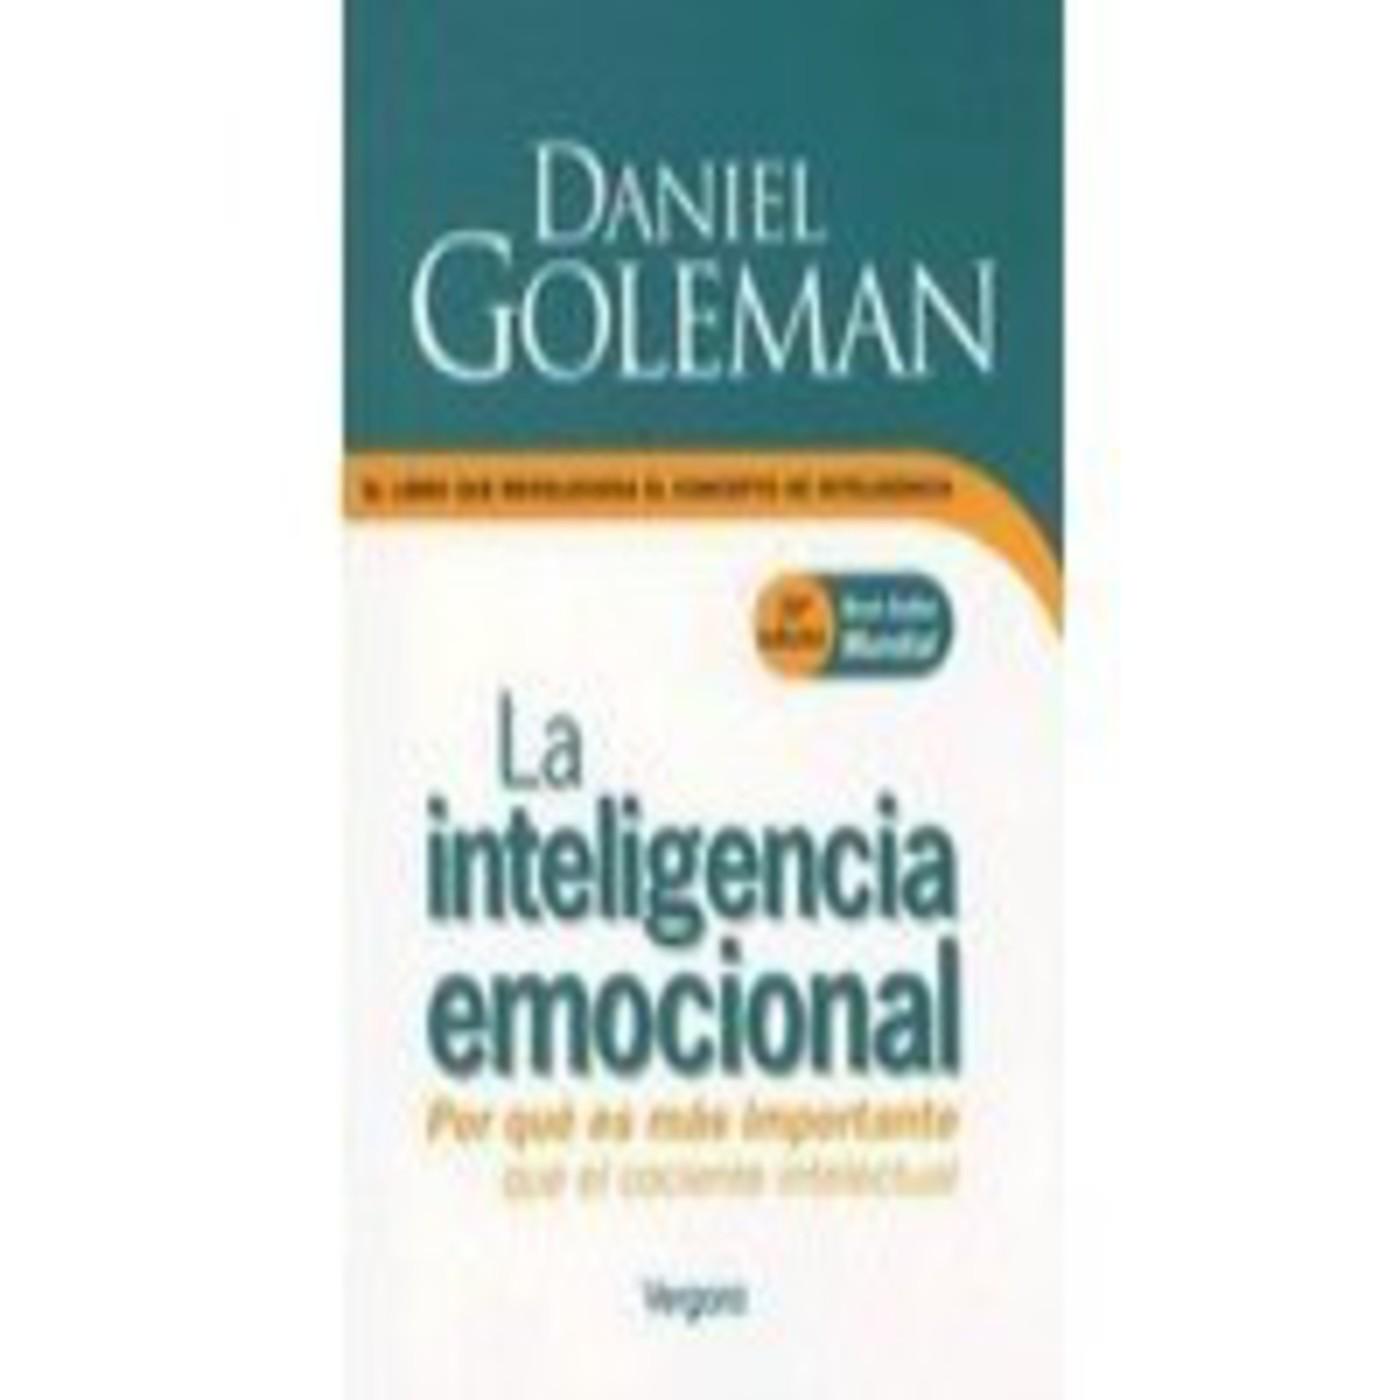 43..INTELIGENCIA EMOCIONAL, Daniel Goleman